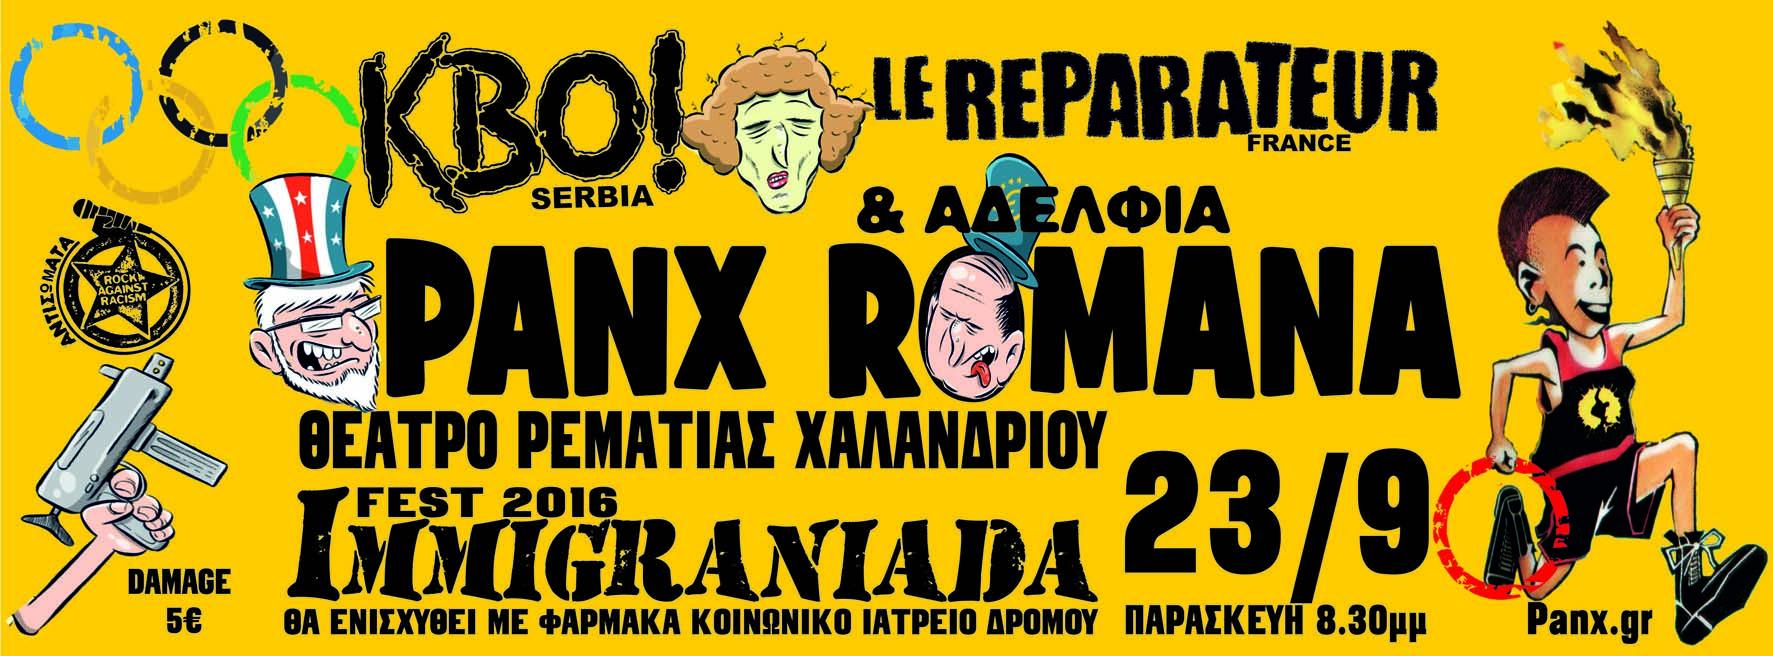 IMMIGRANIADA Festival στο θέατρο Ρεματιάς Χαλανδρίου